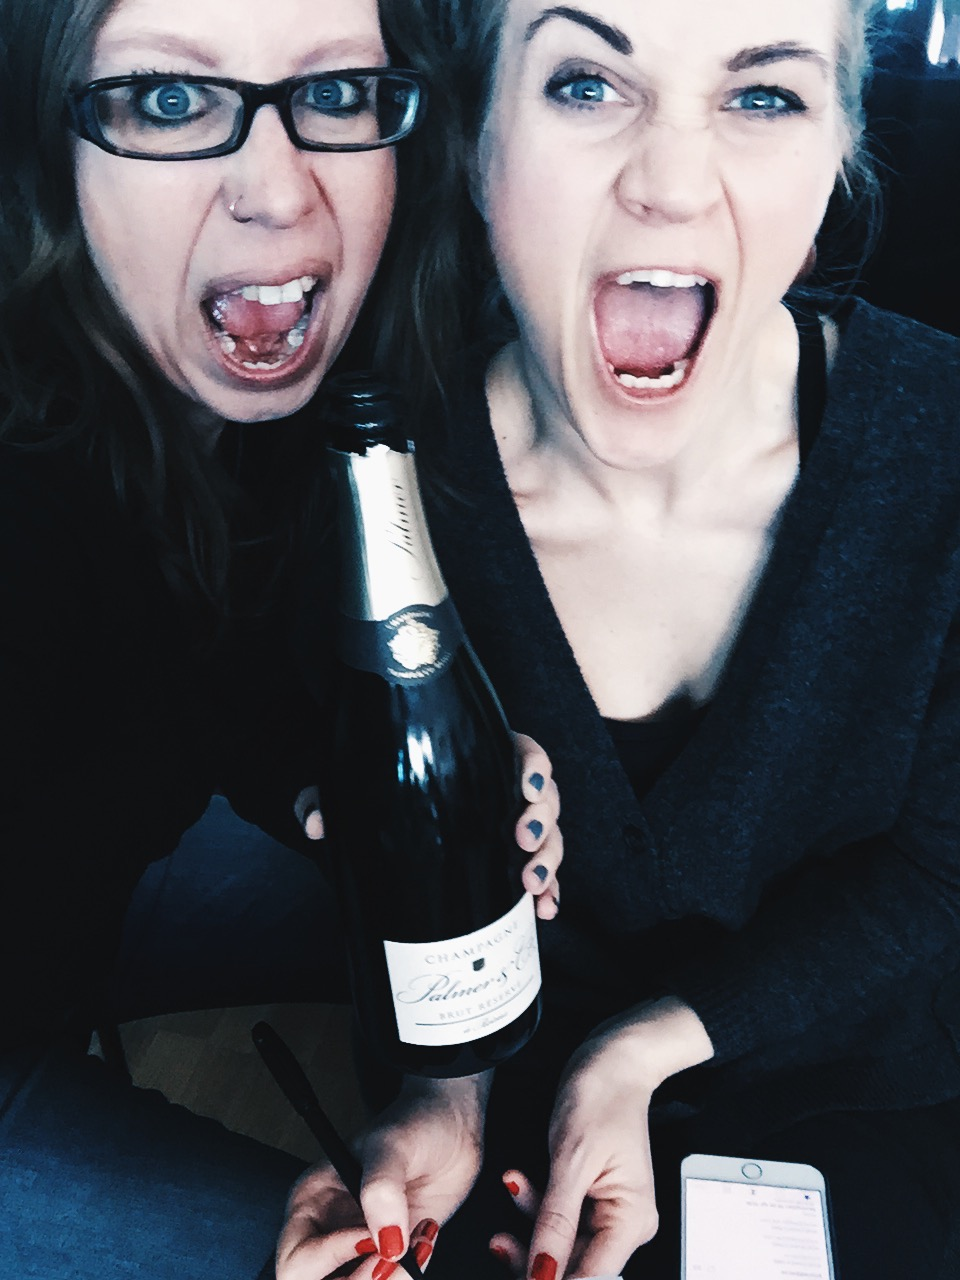 me lina champagne valborg